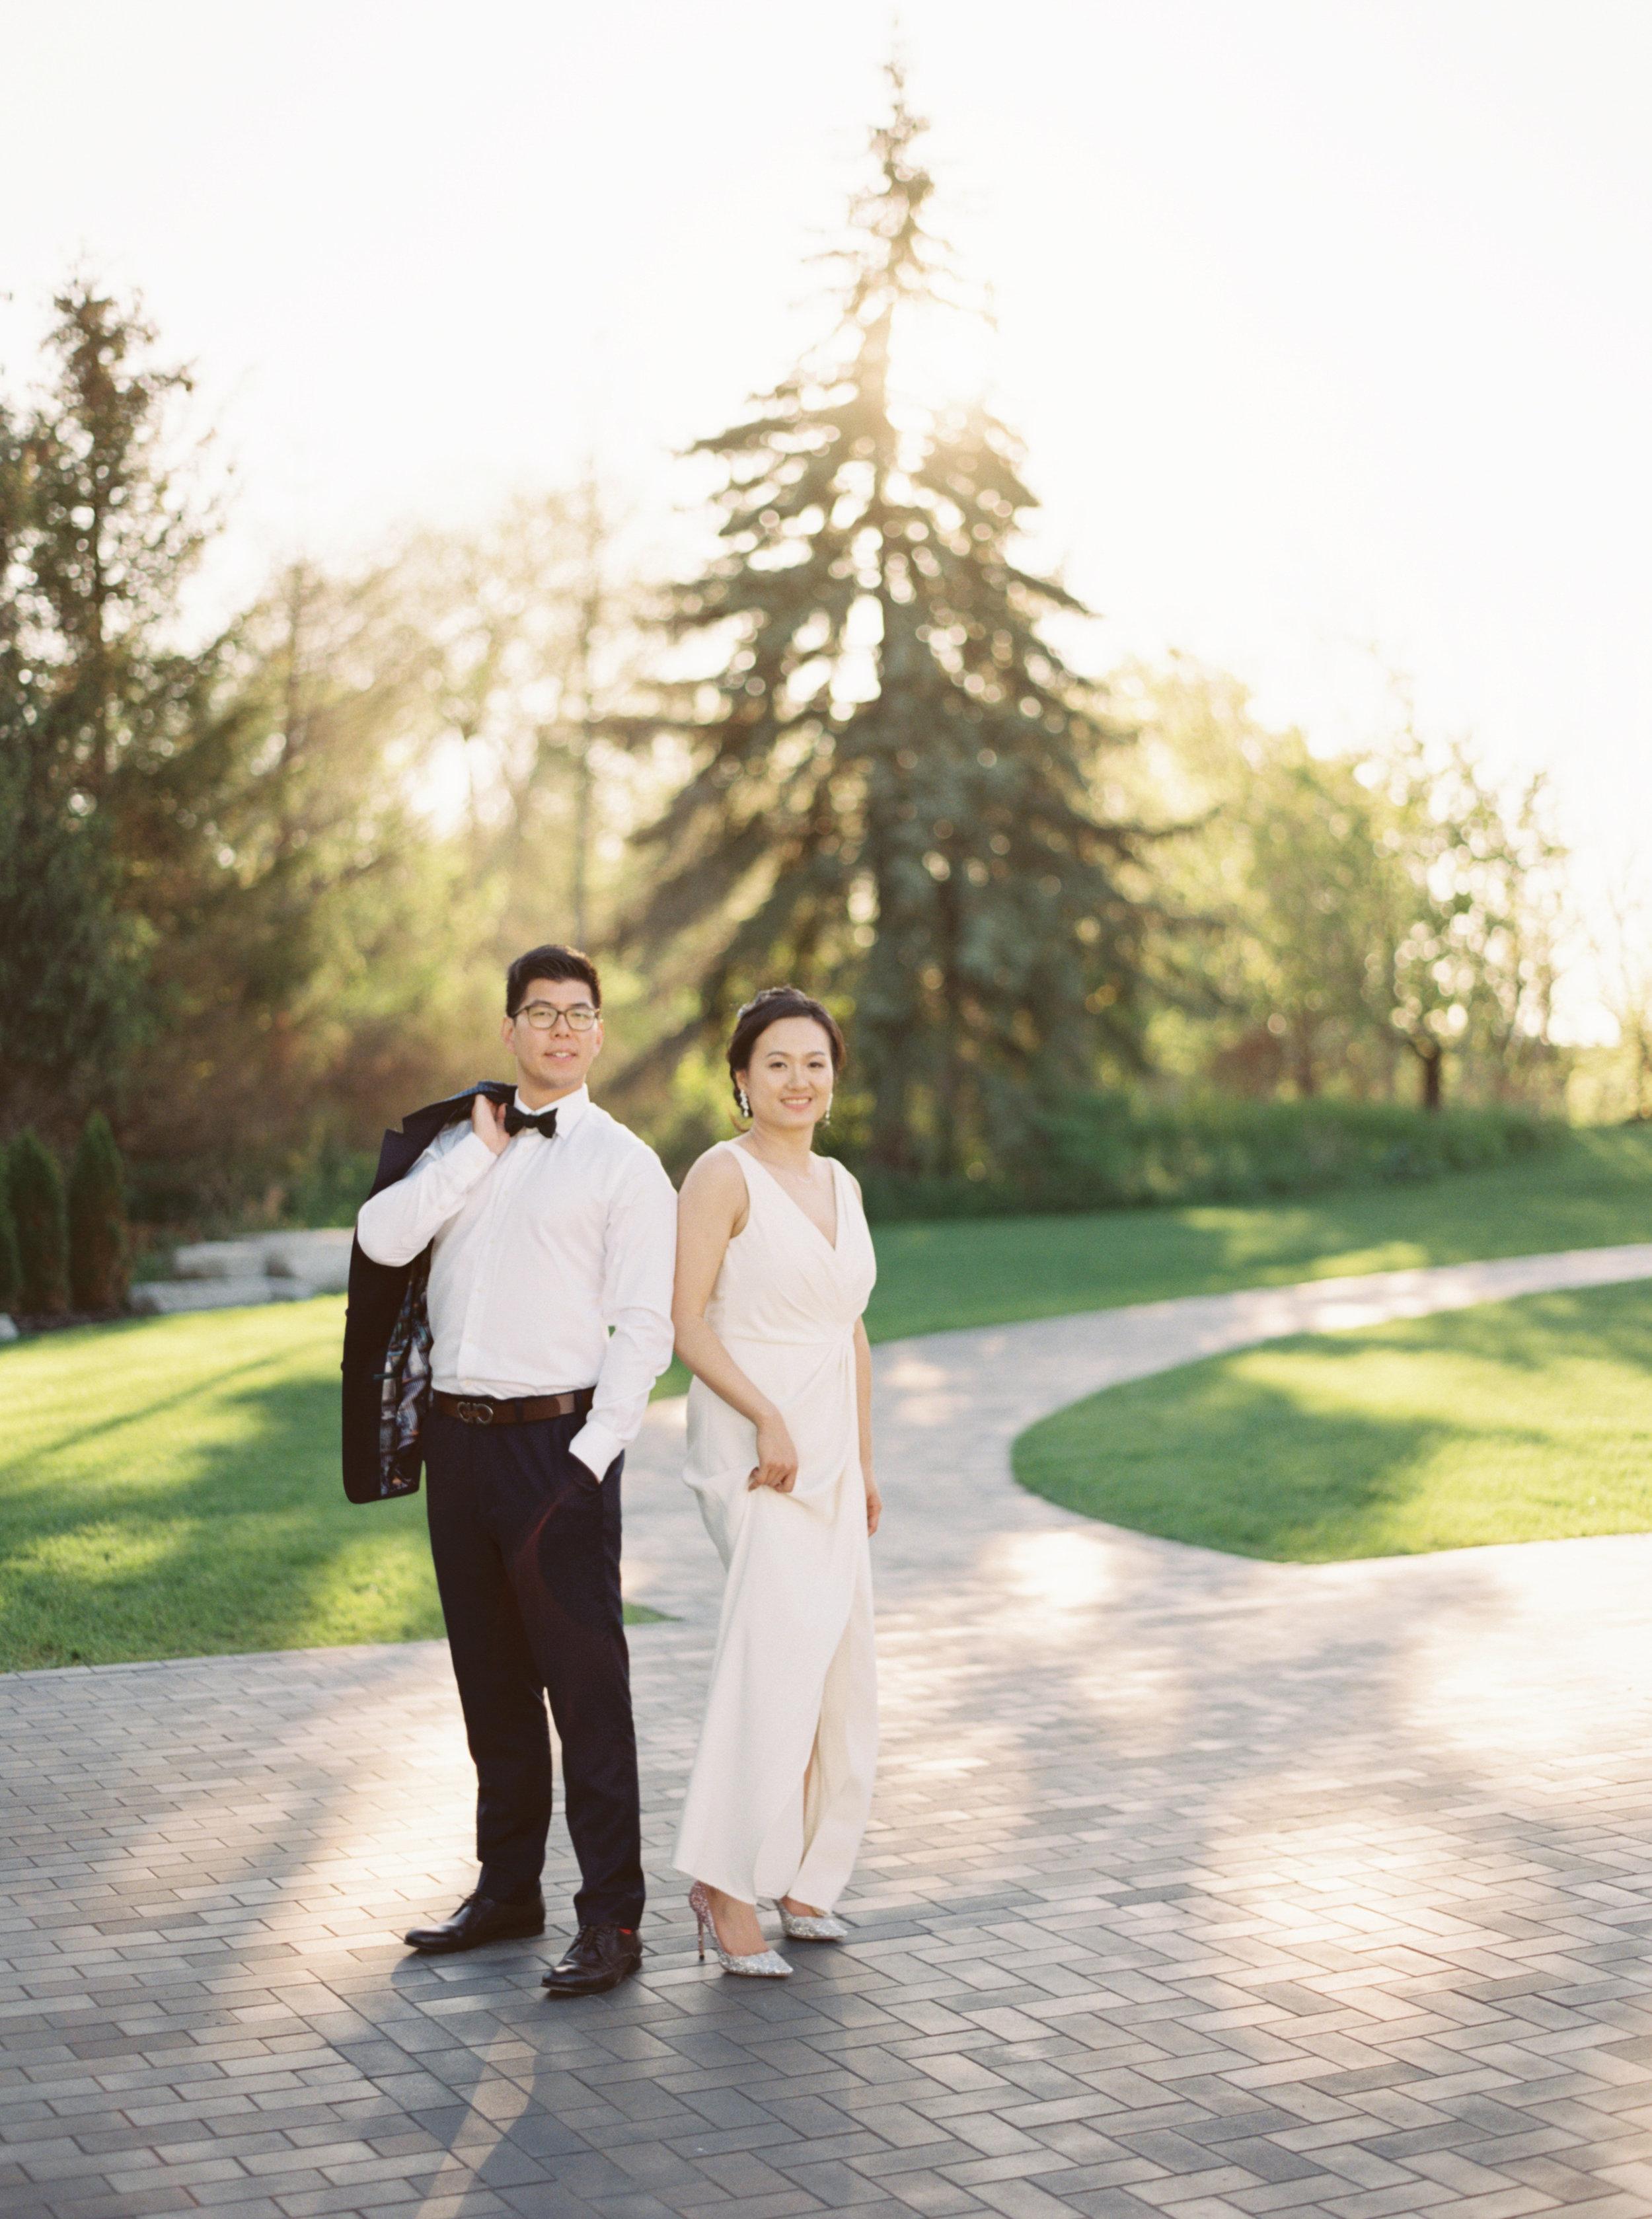 Arlington Estate Wedding - Sunset Photos-23.jpg